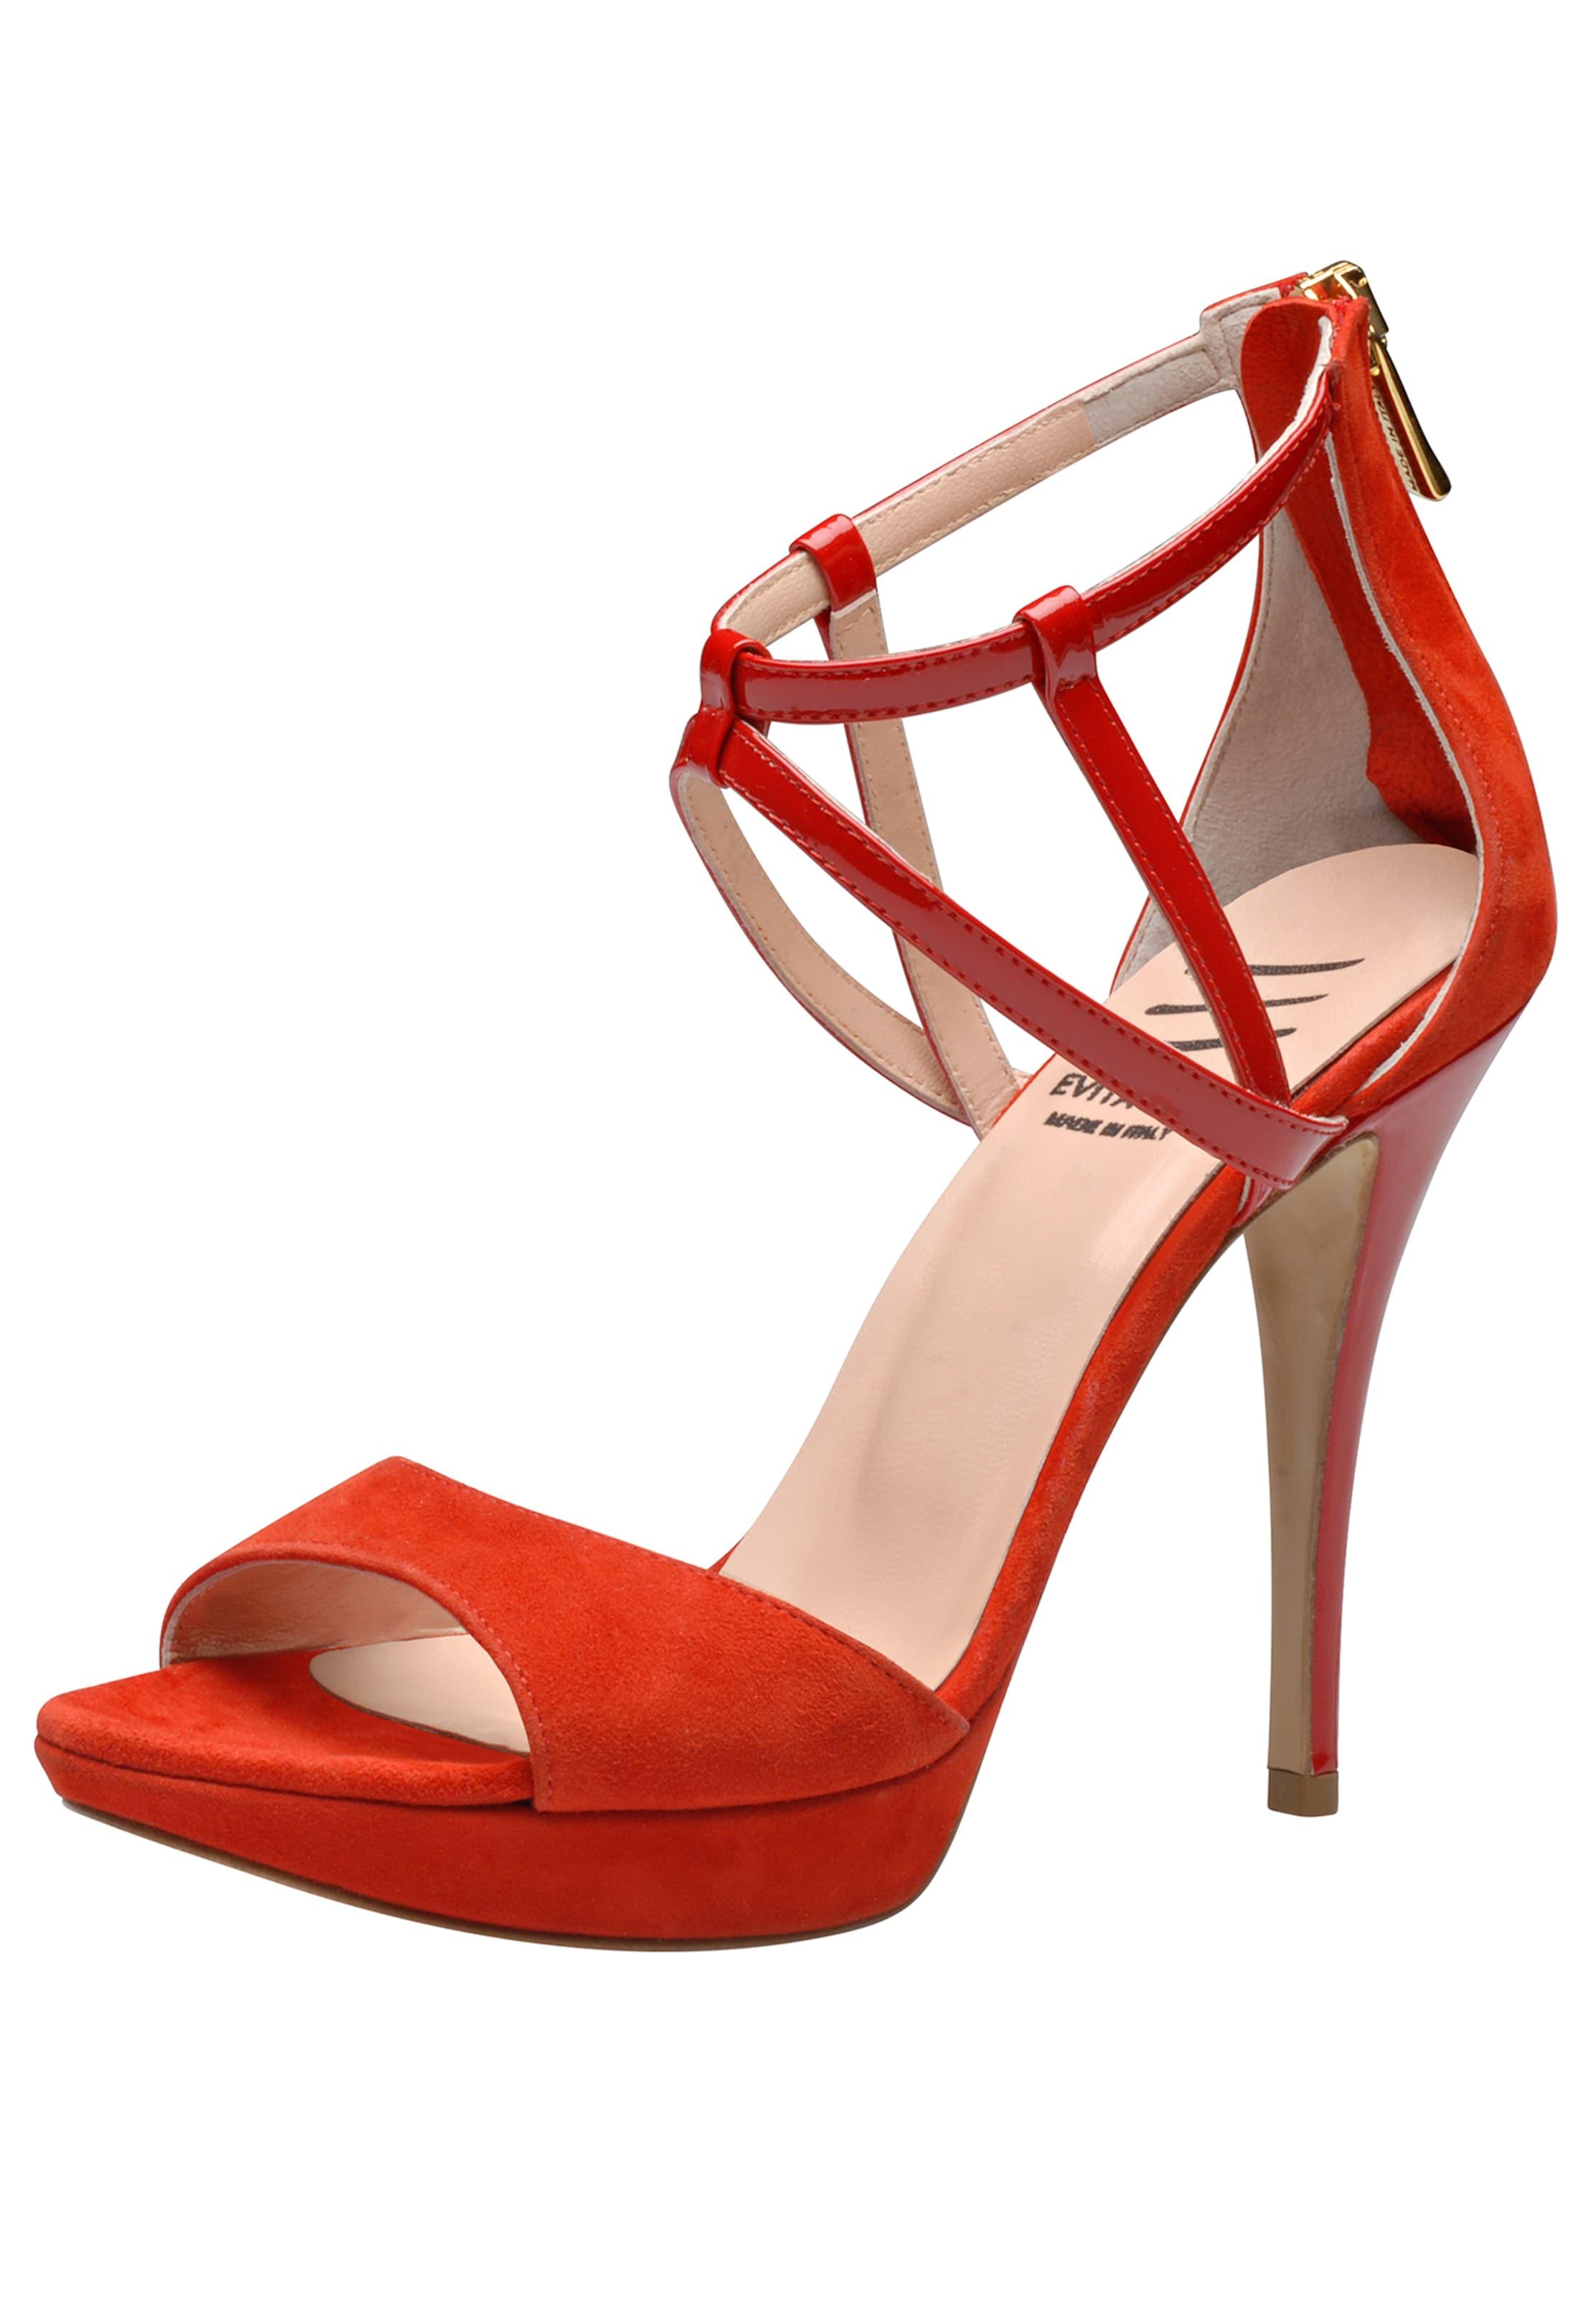 EVITA Damen Sandalette Kostengünstig Mwf17tS63l